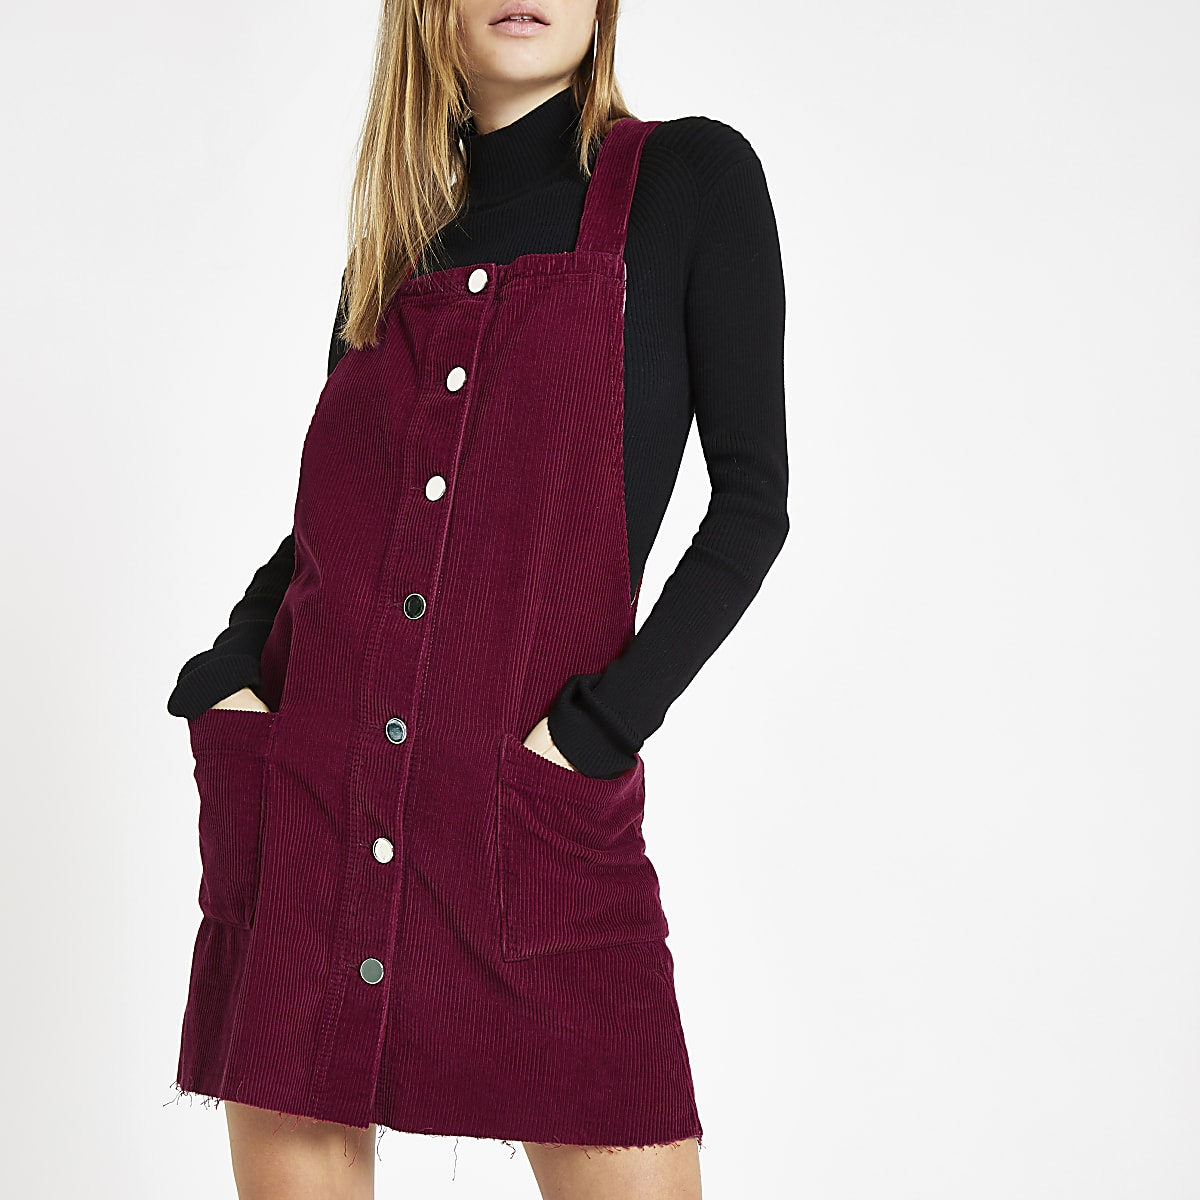 Dark red cord overall dress